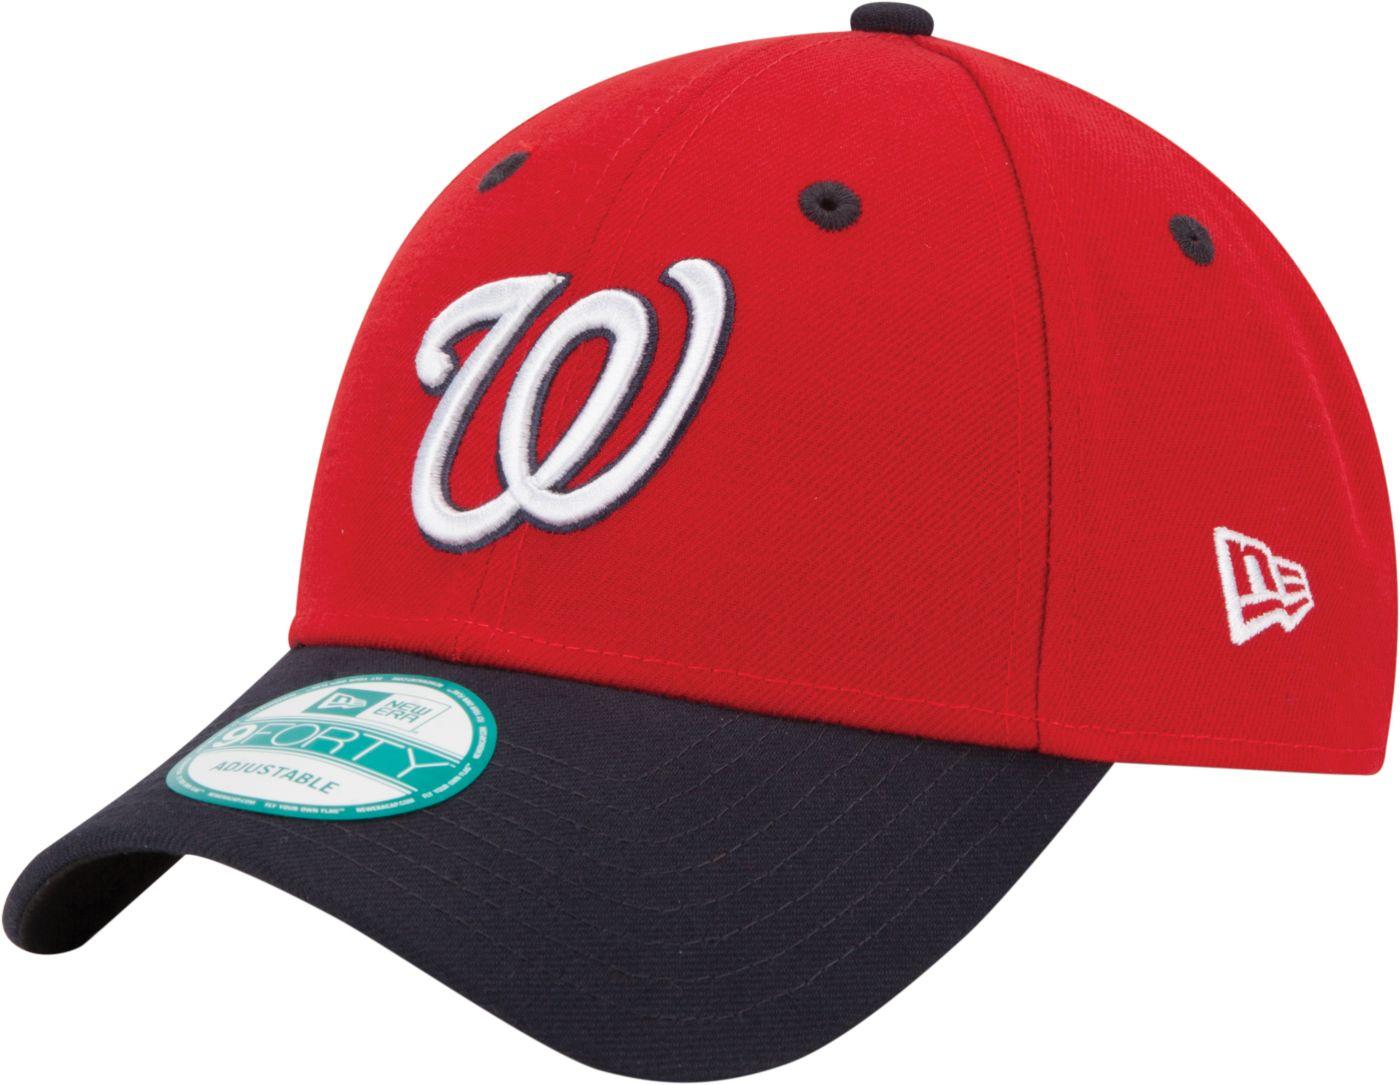 New Era Men's Washington Nationals 9Forty Red Adjustable Hat